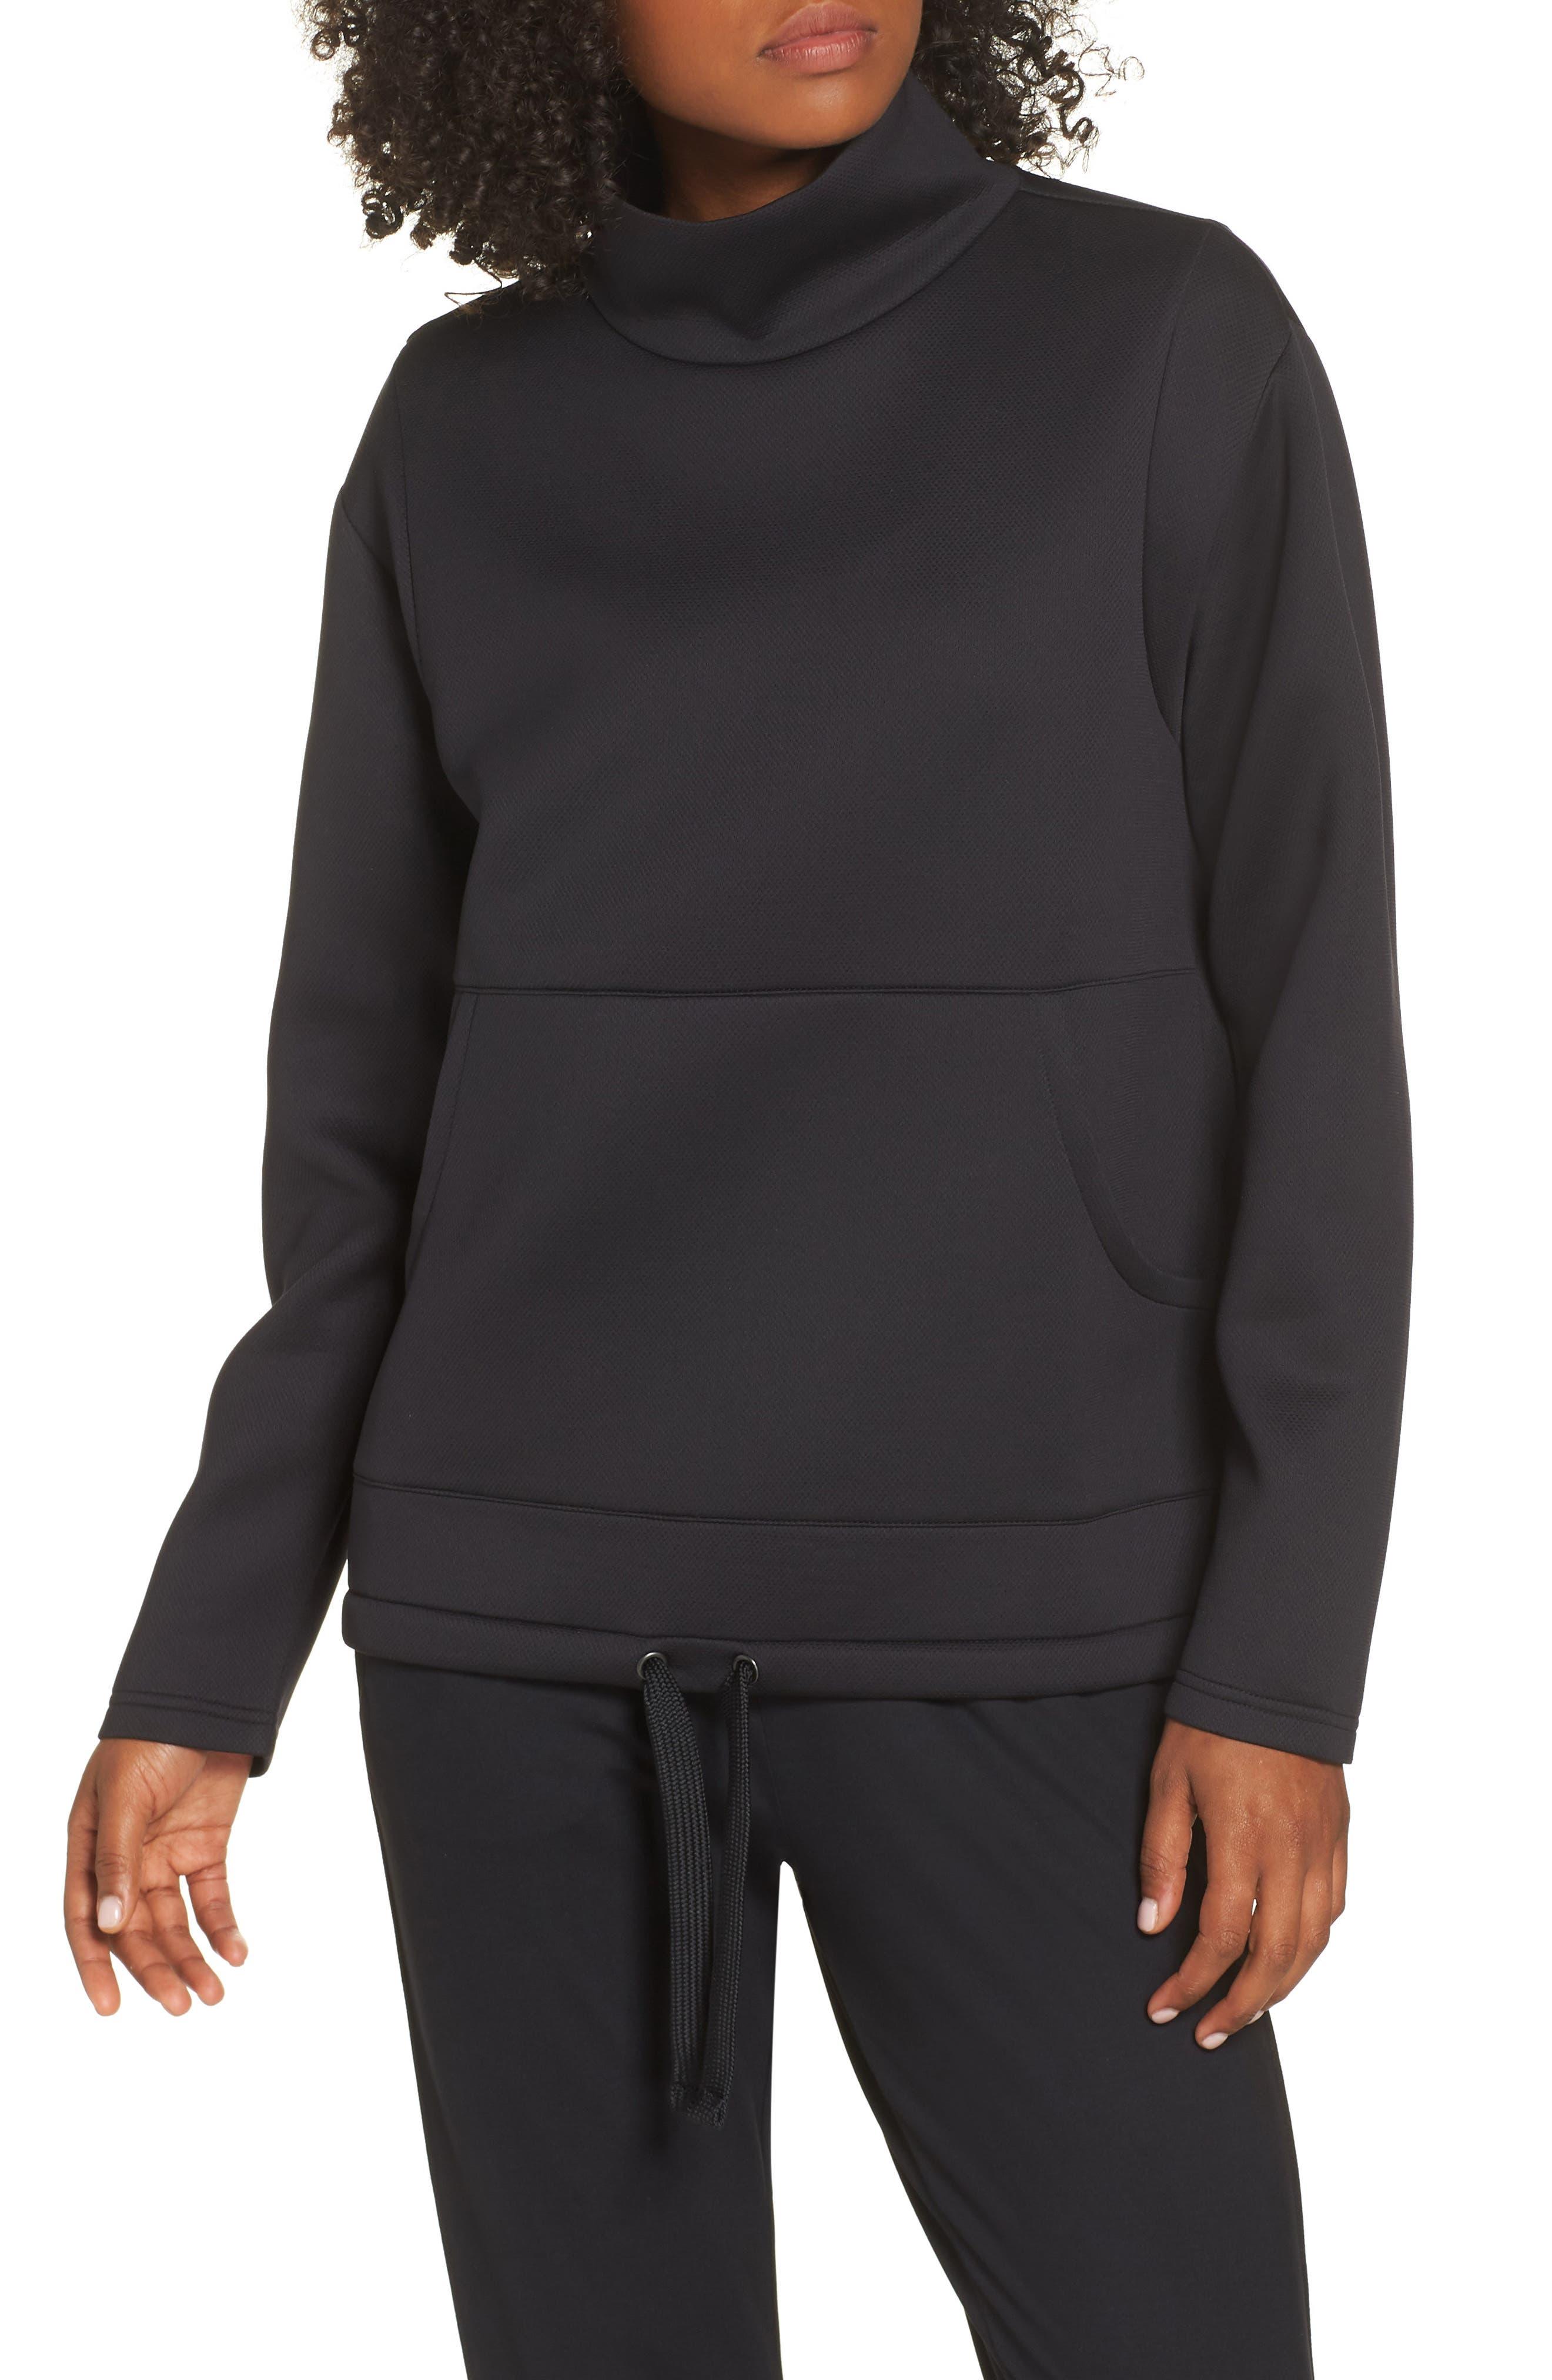 All About It Funnel Neck Sweatshirt,                         Main,                         color, BLACK